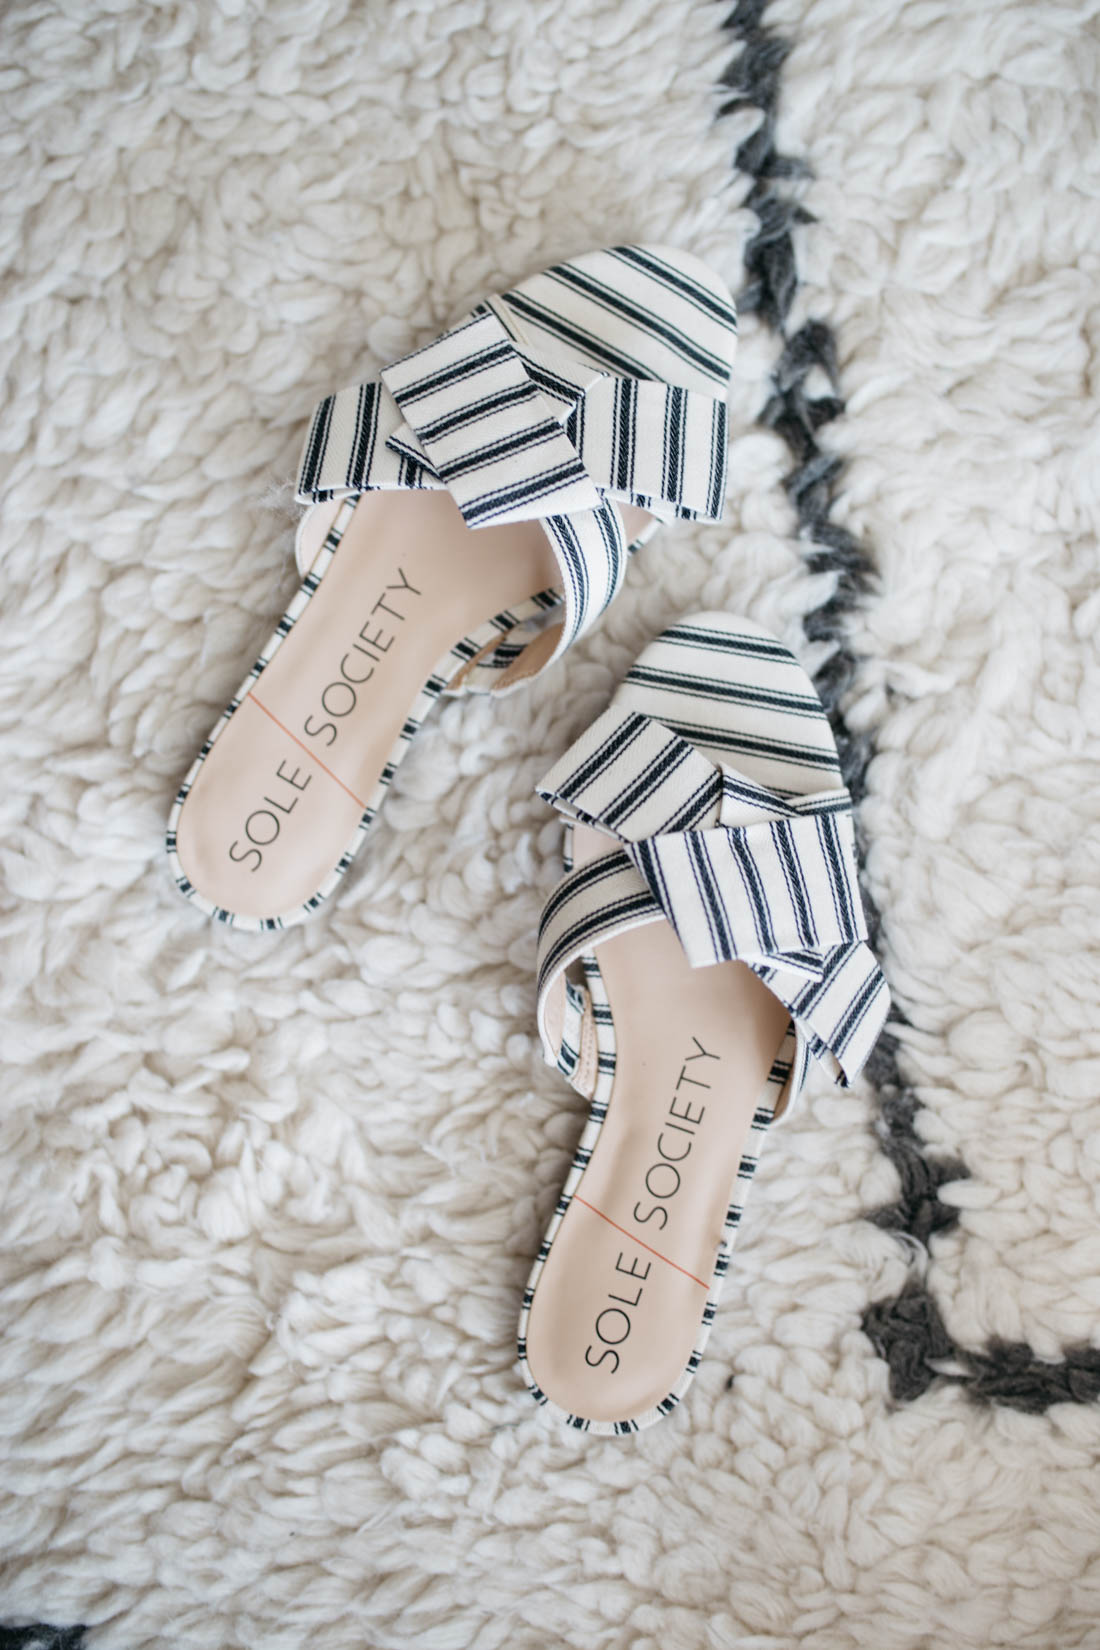 Spring Sandal Trend